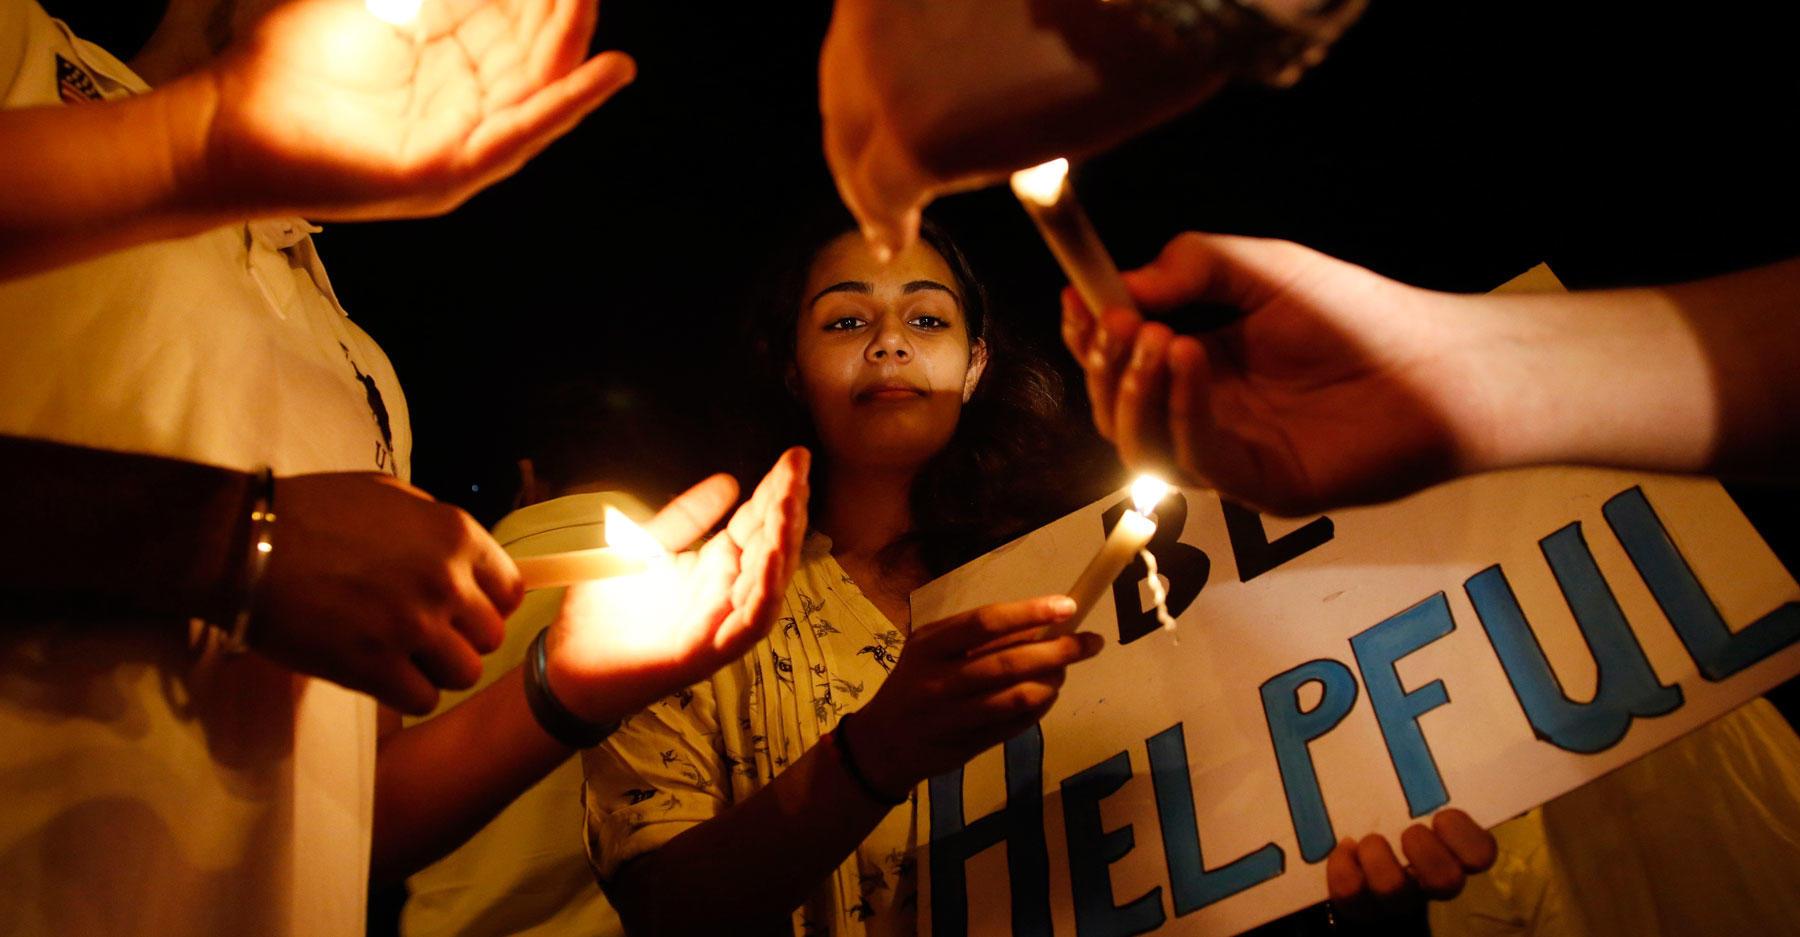 Nepal candlelight vigil (AP)